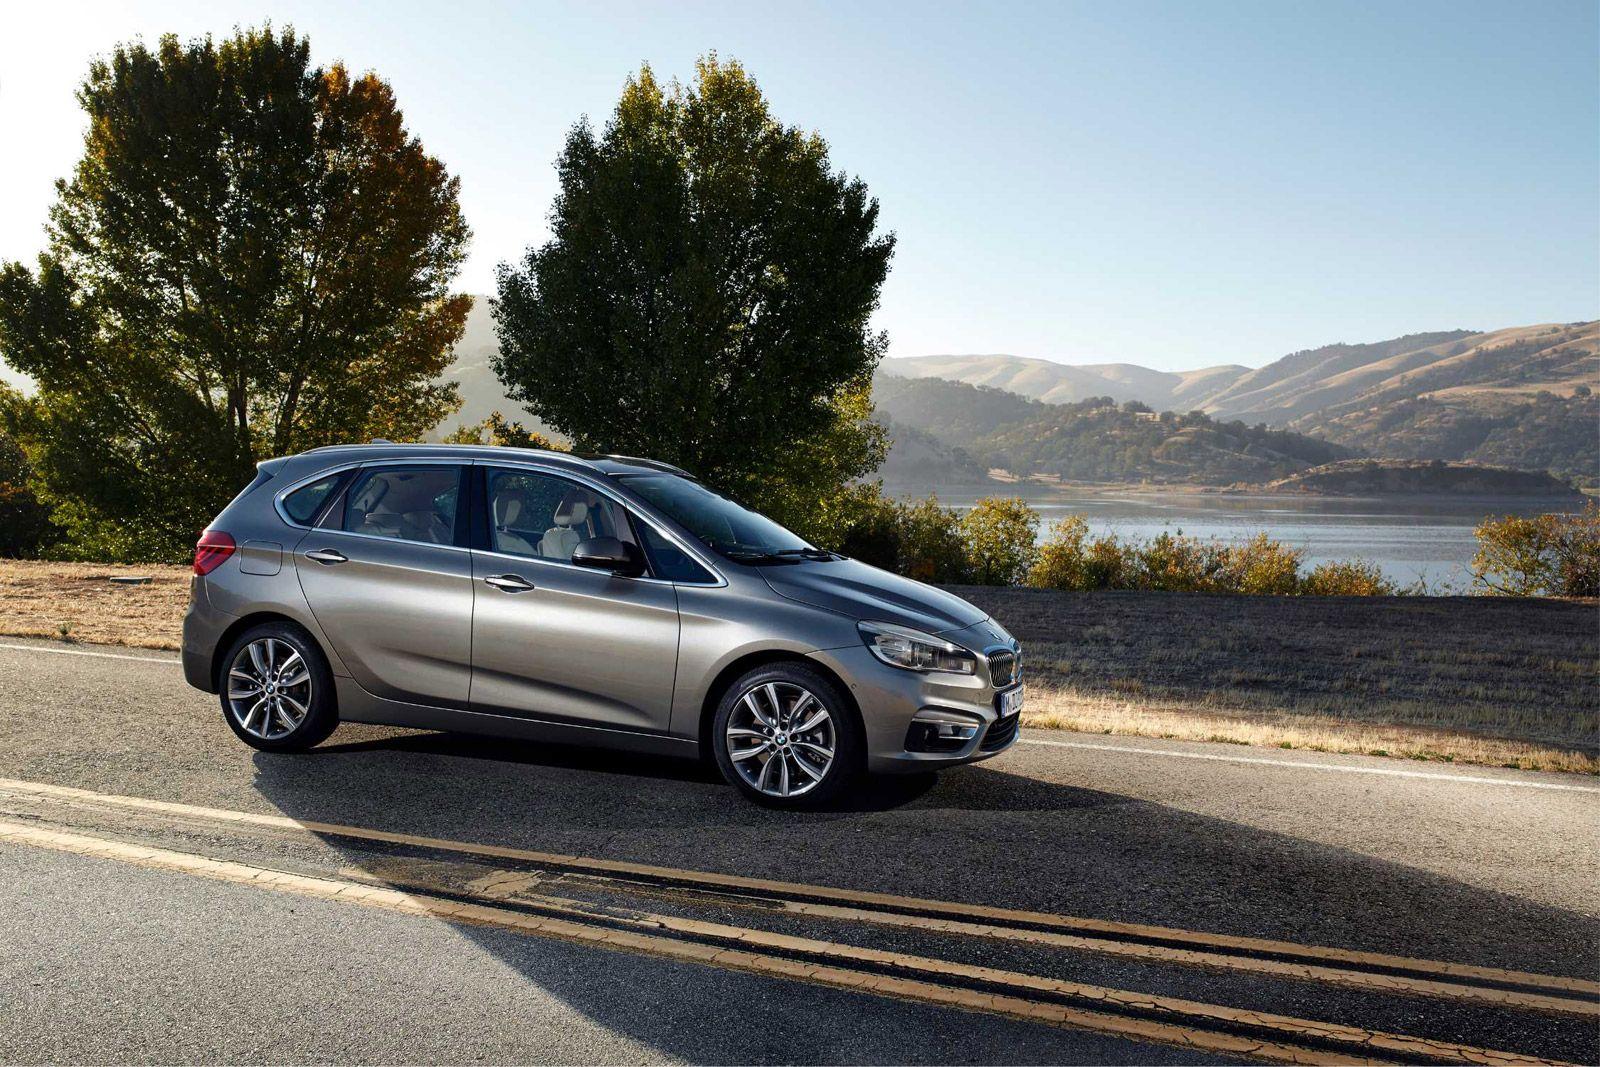 2014 BMW 2-Series Active Tourer Revealed: Video